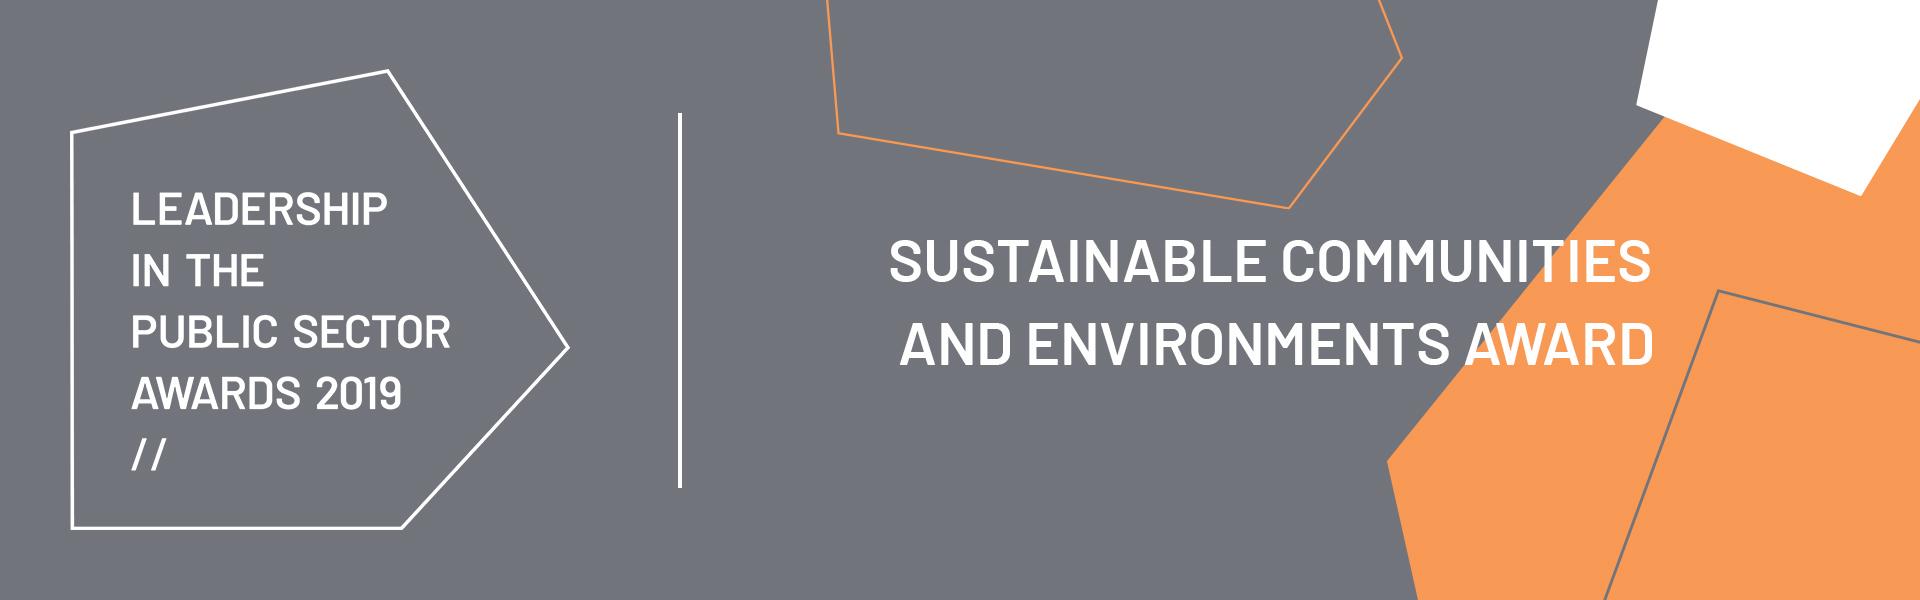 Sustainable Communities & Environments Award_1920x600_V1.jpg